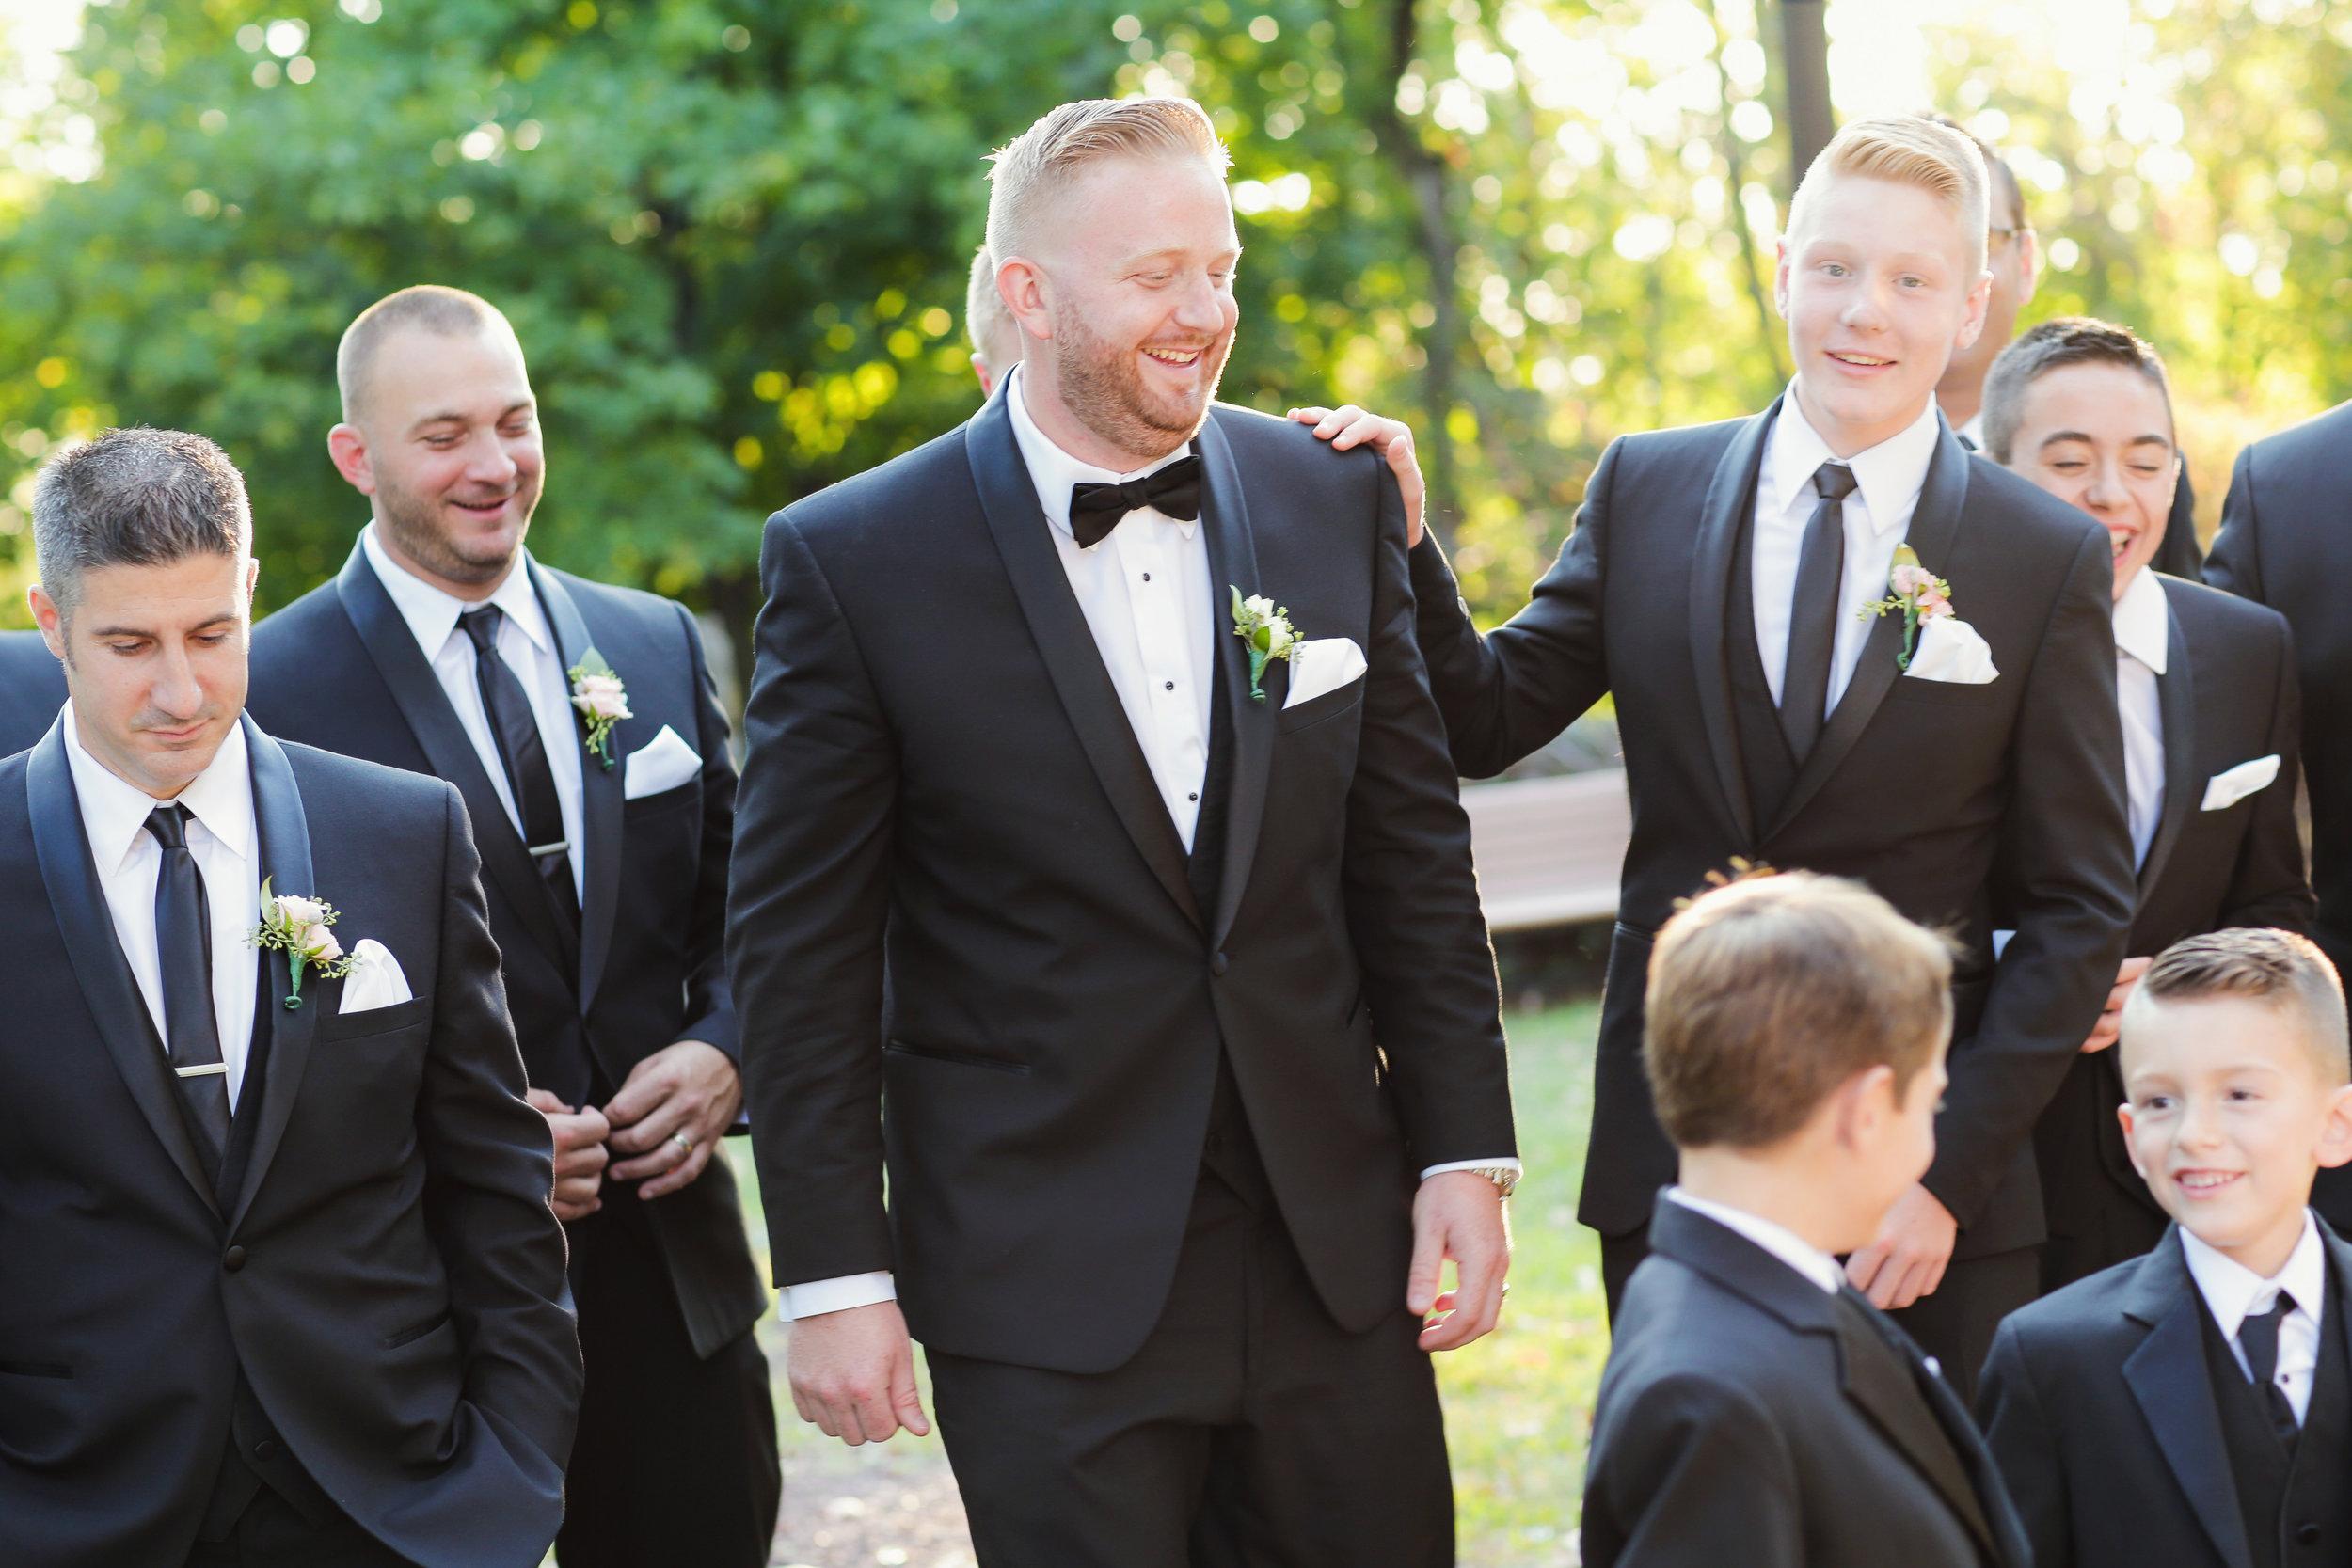 Groom wearing black slim fit shawl tuxedo